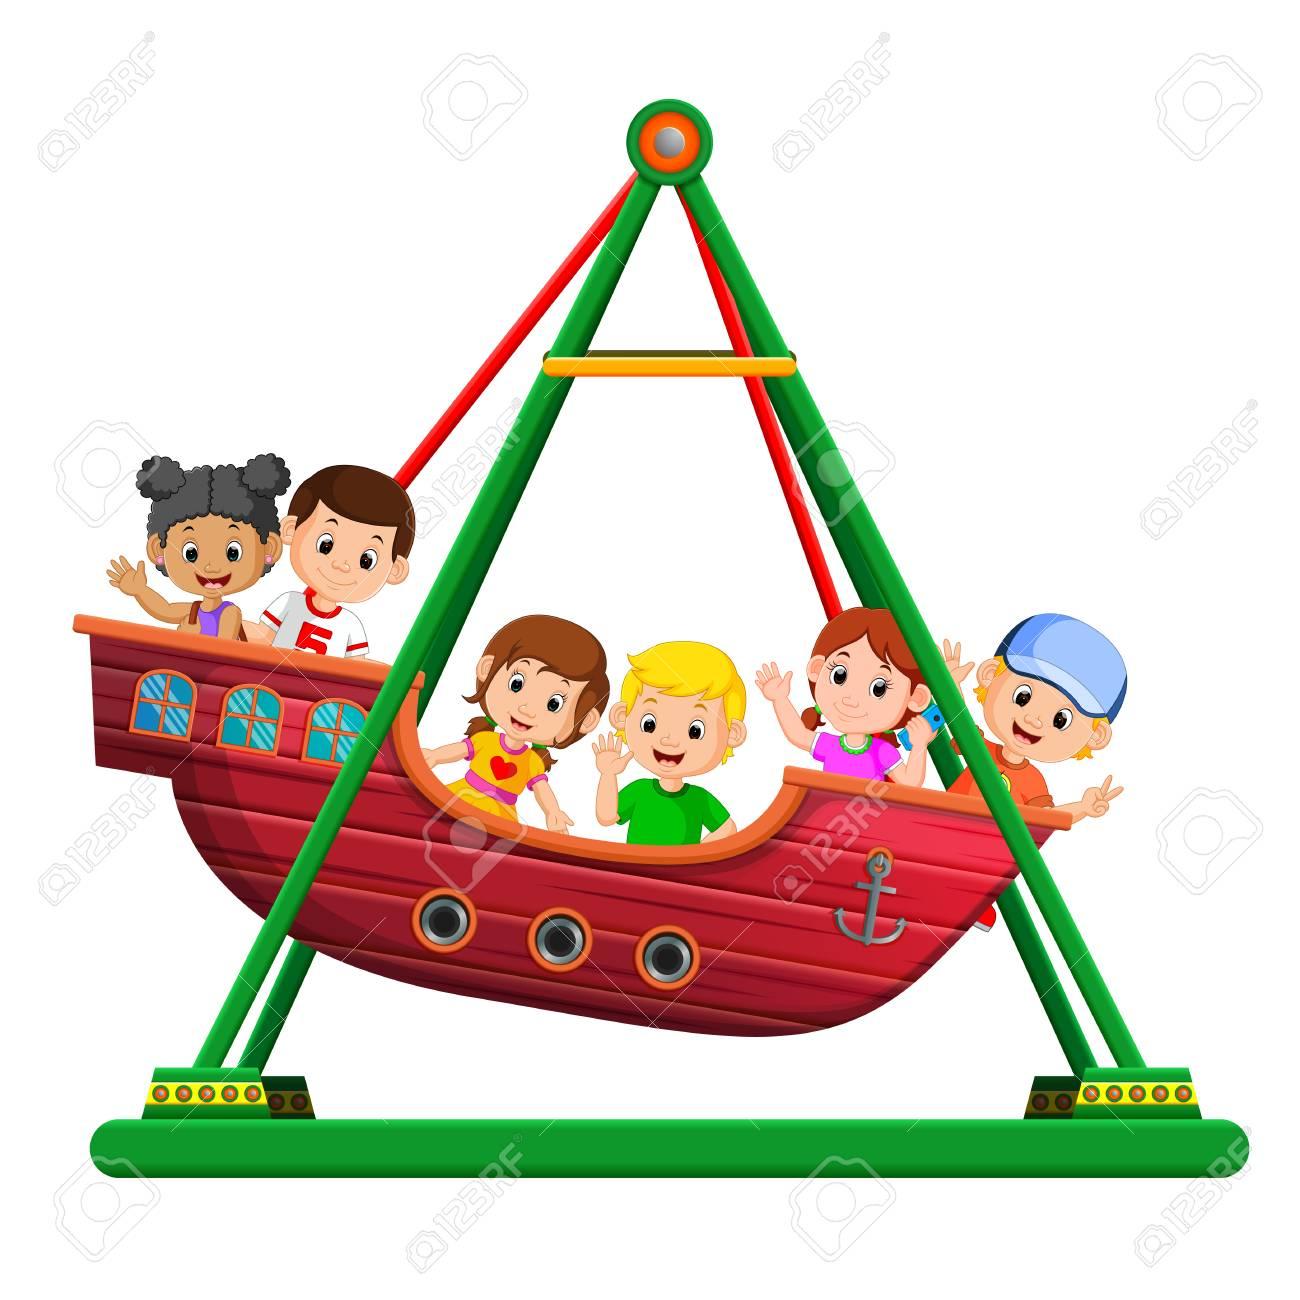 Children on viking ride at carnival.